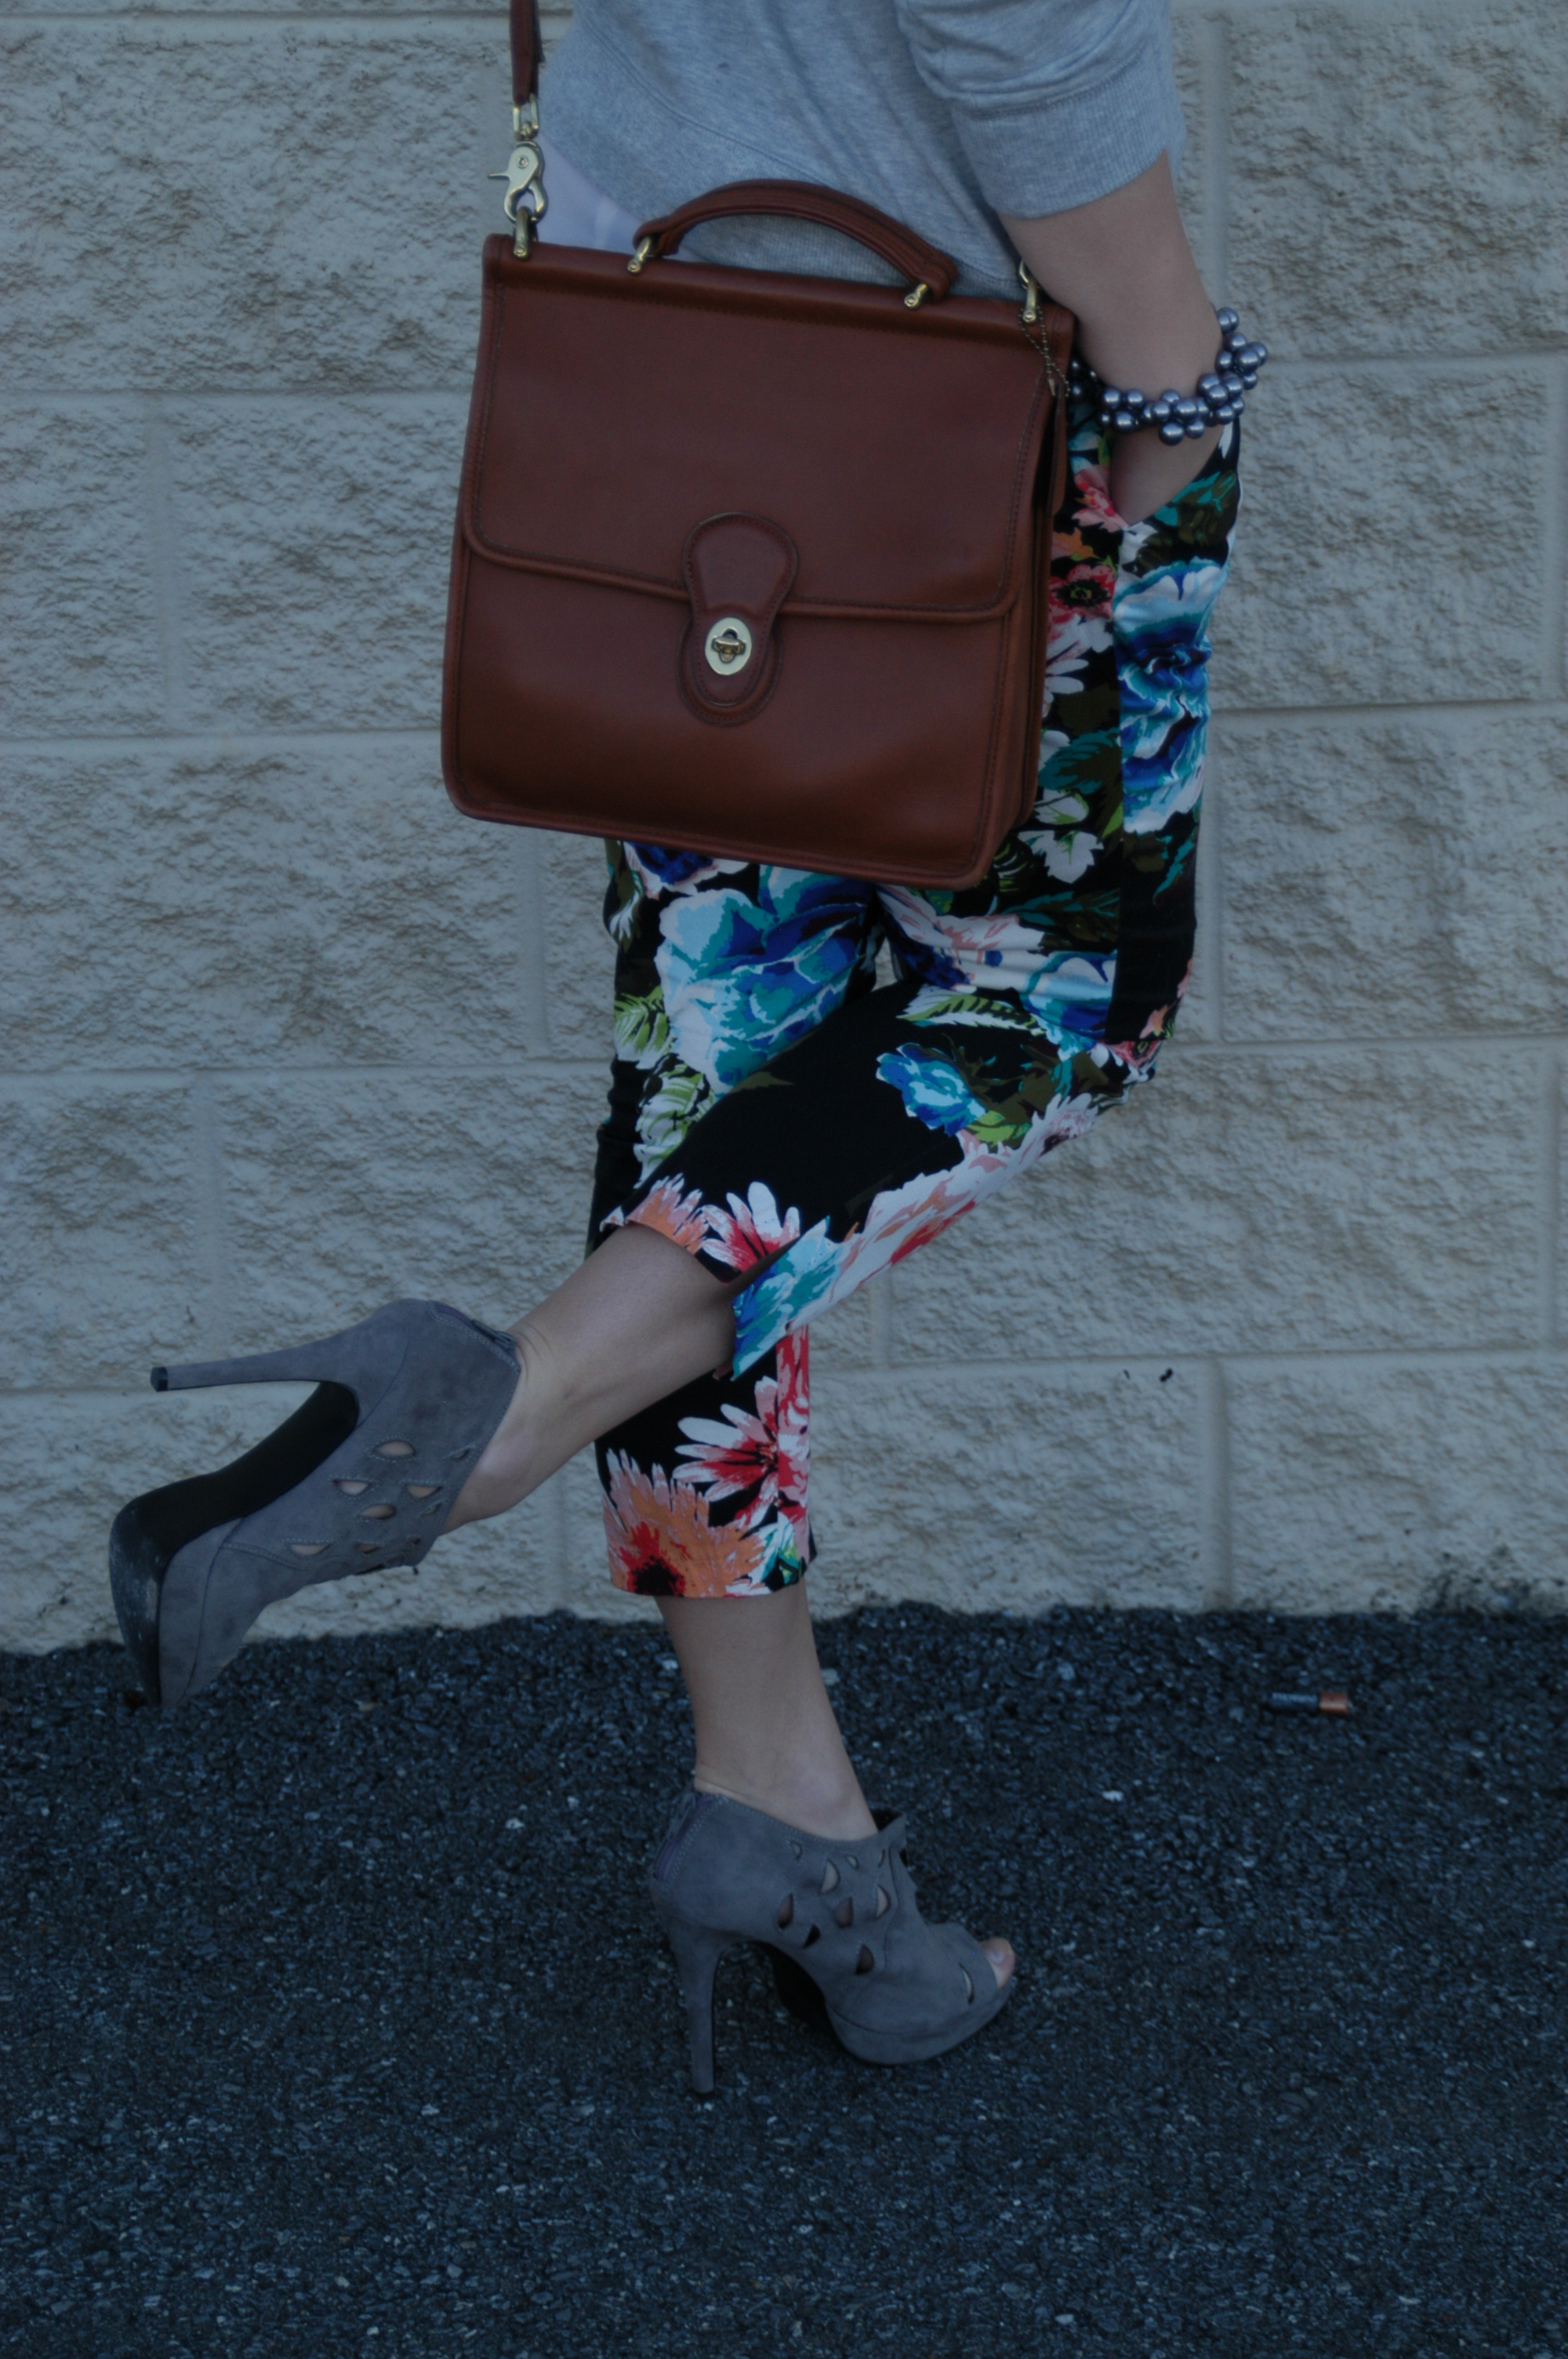 Pants: H&M | Sweatshirt: Mango | Blouse: H&M | Shoes:  Sole Society | Bag: Coach (Willis) | Bracelet: Gift | Watch: Target | Shades: H&M | Earrings:  meeleecouture  via Etsy